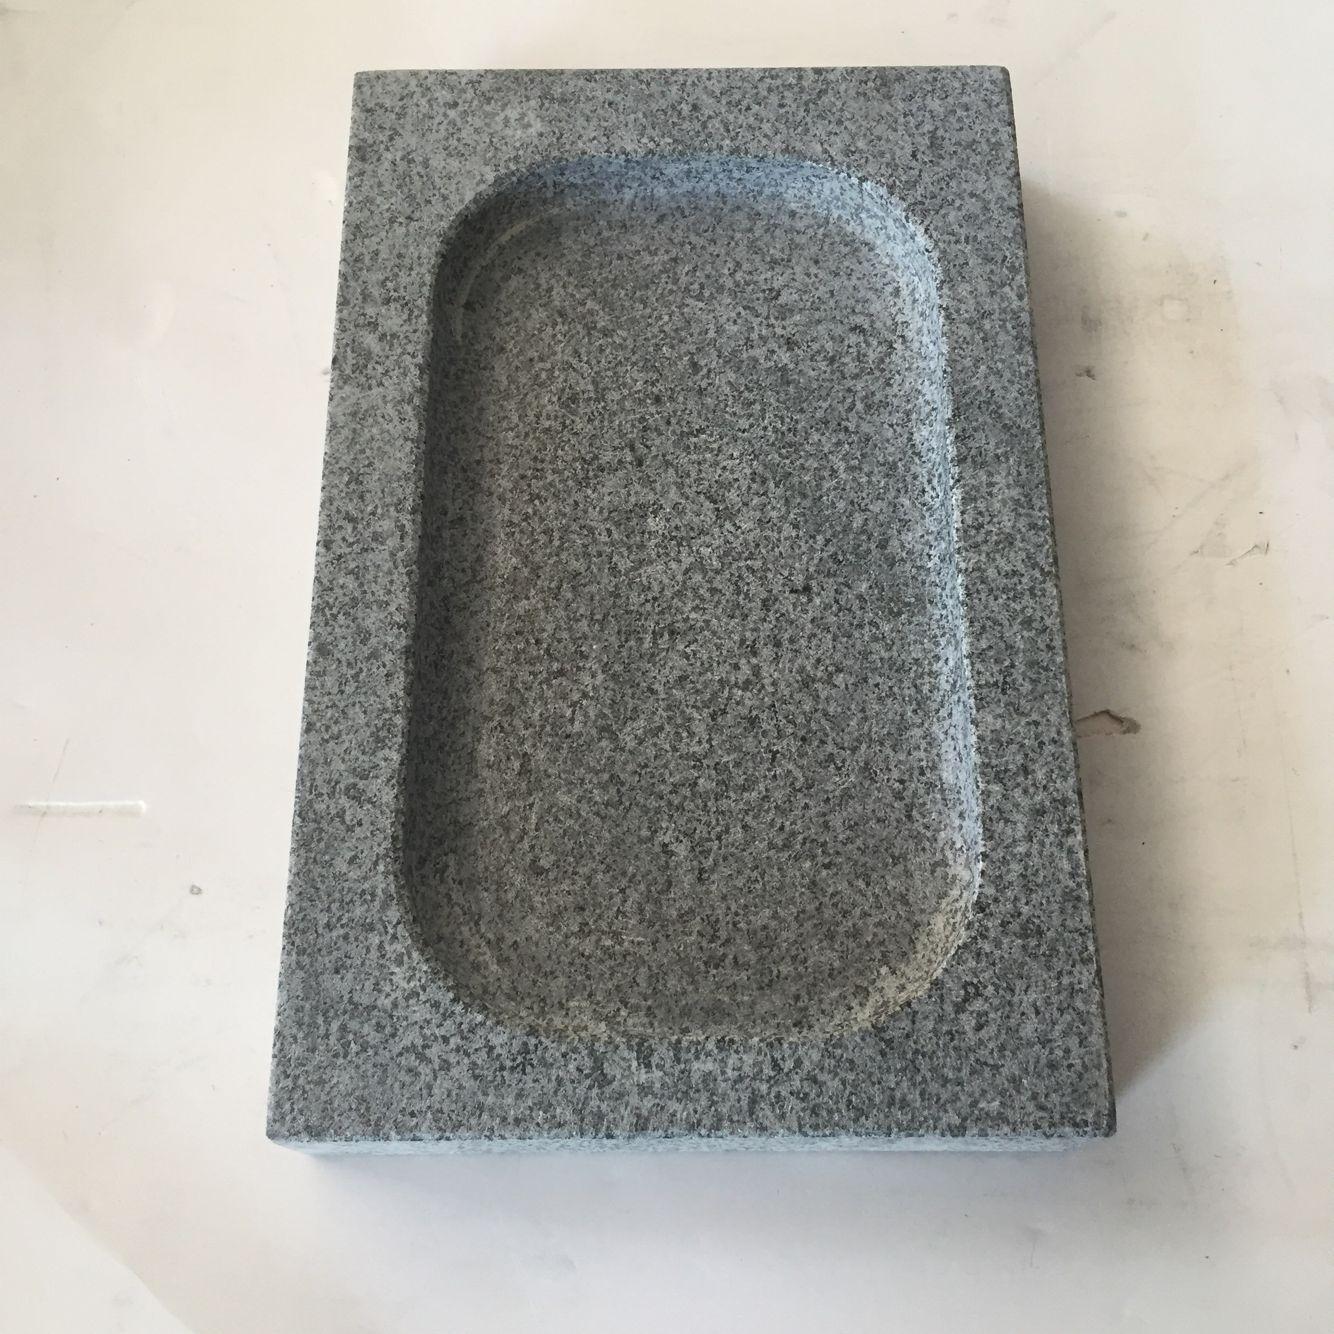 Wholesale of Korean Flagstone Roasting Tofu Plate Roasting Furnace, Barbecue Flagstone Pot Featured Image